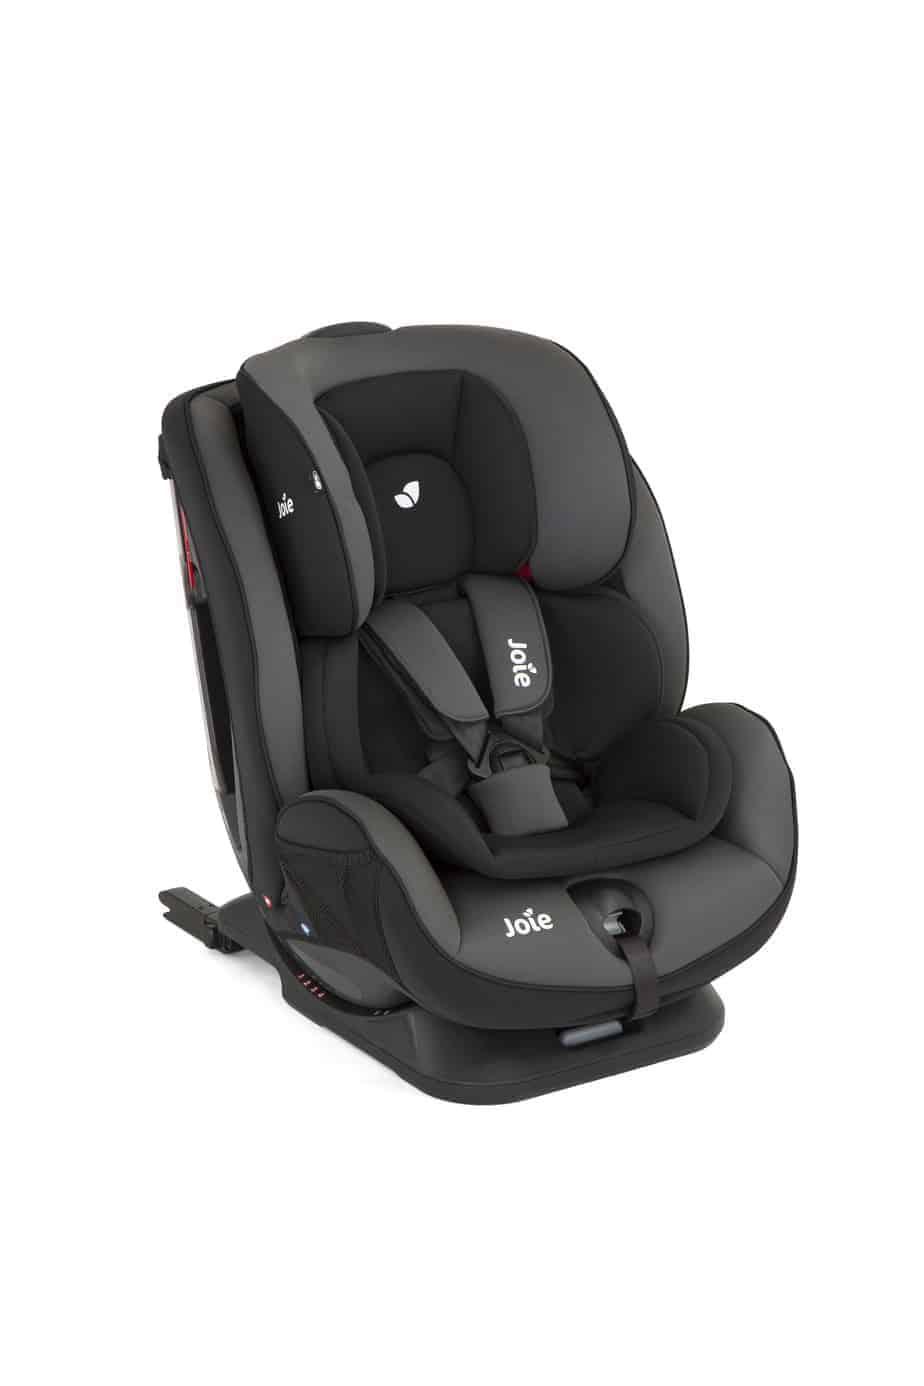 כיסא בטיחות מדגם סטייג'ס אף אקס Stages Fx